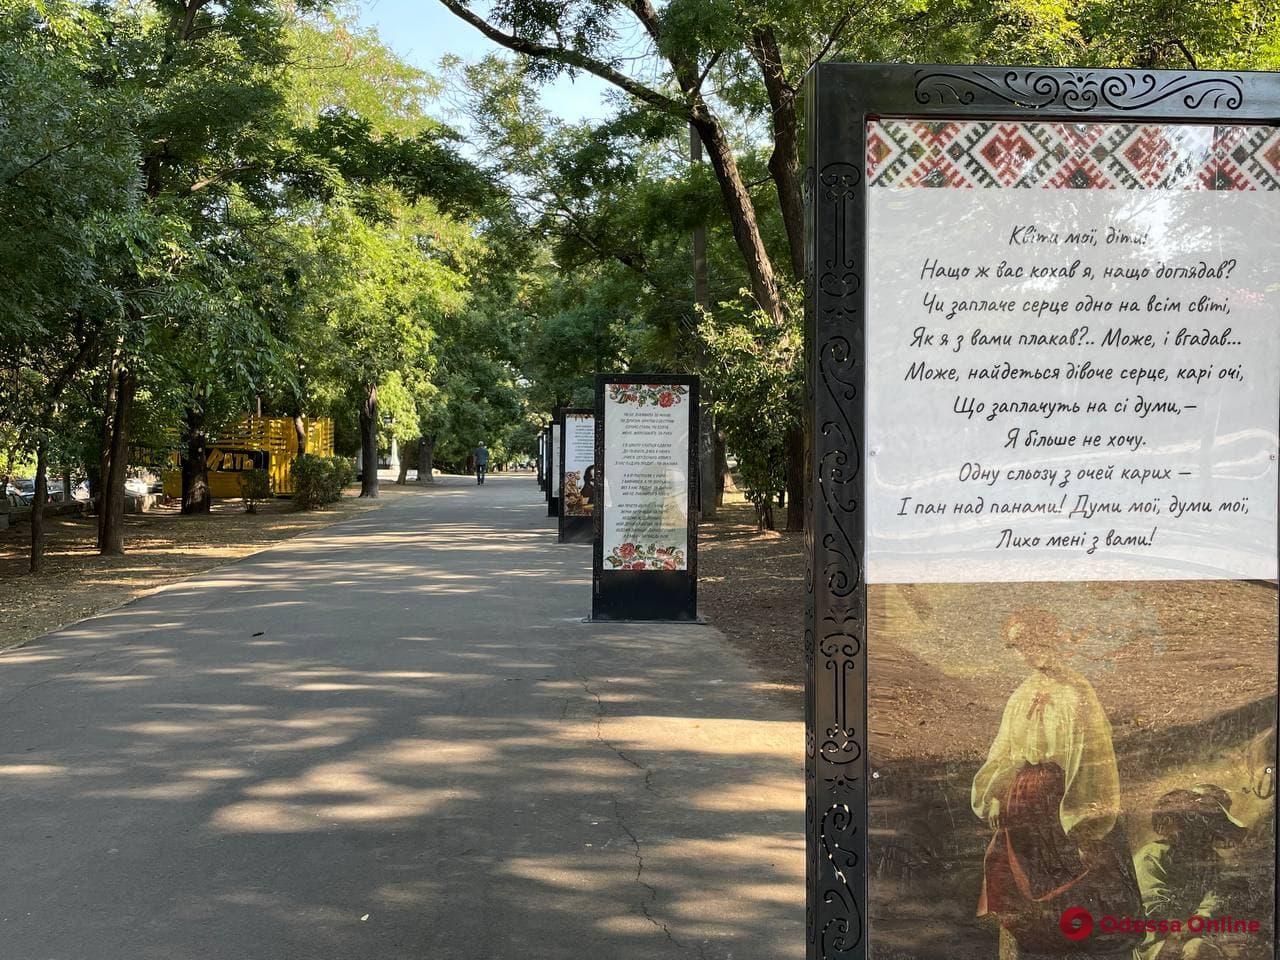 В Одессе появилась аллея Тараса Шевченко (фото)